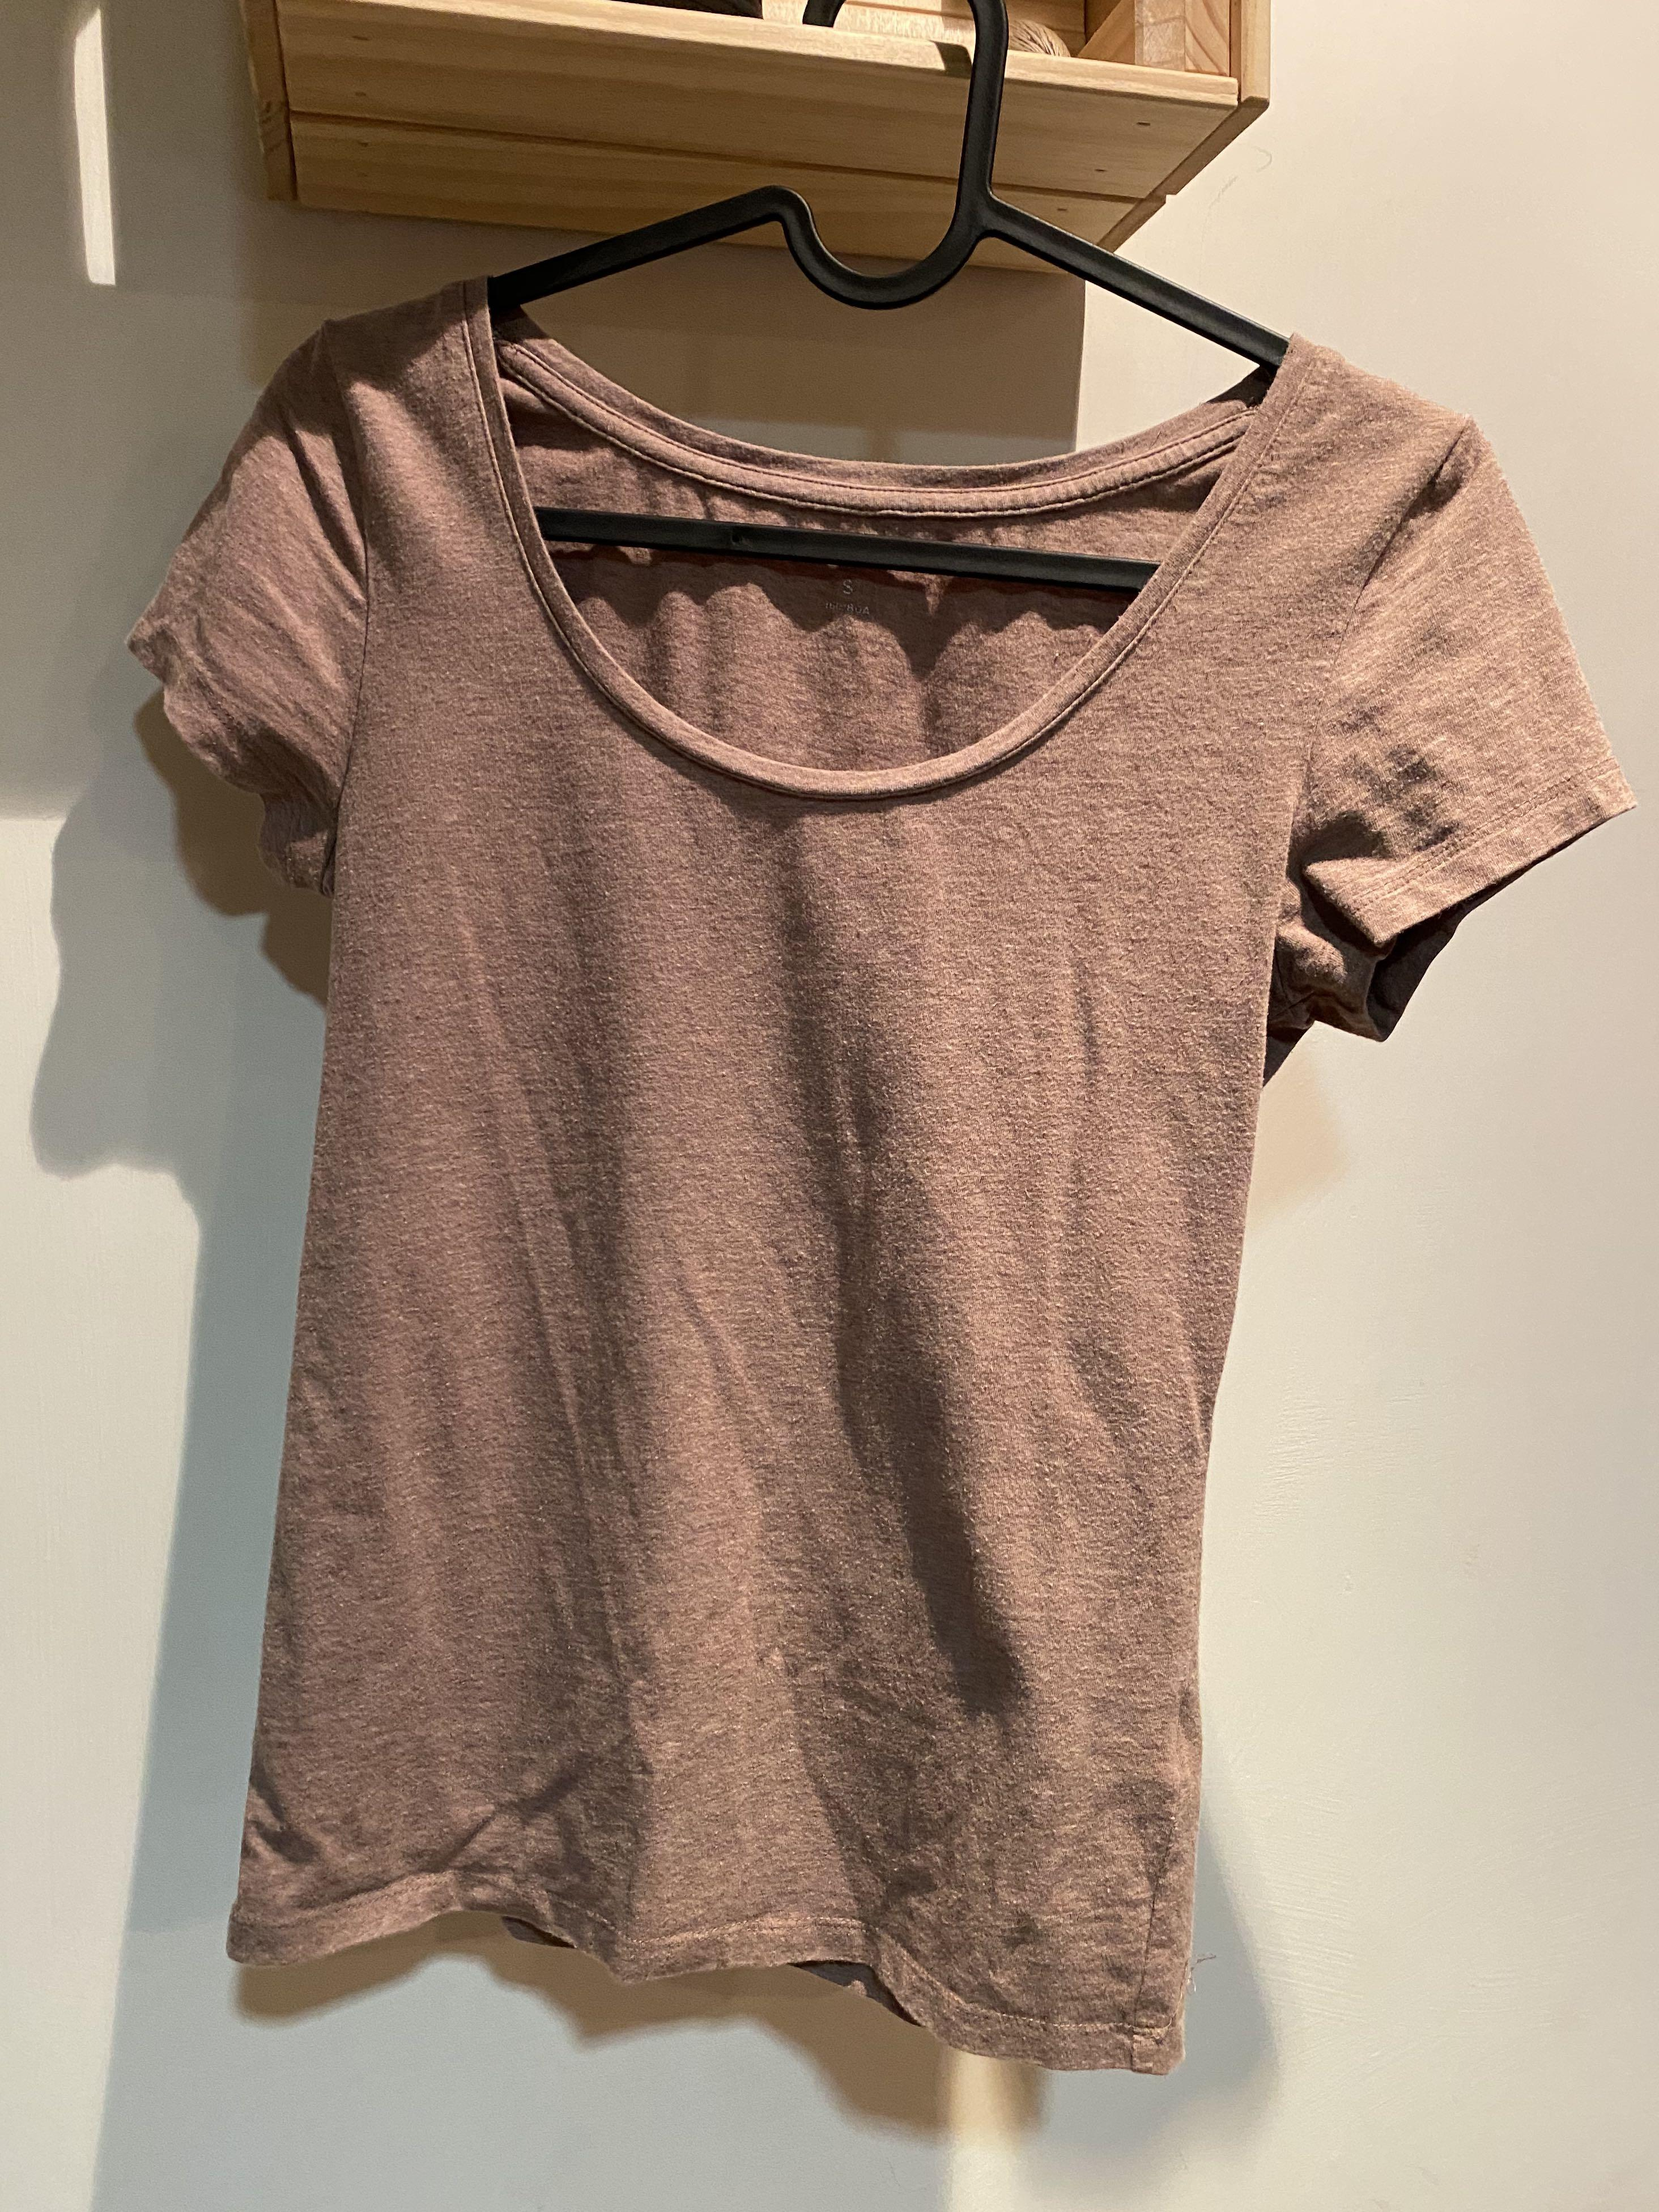 Net短袖上衣T恤